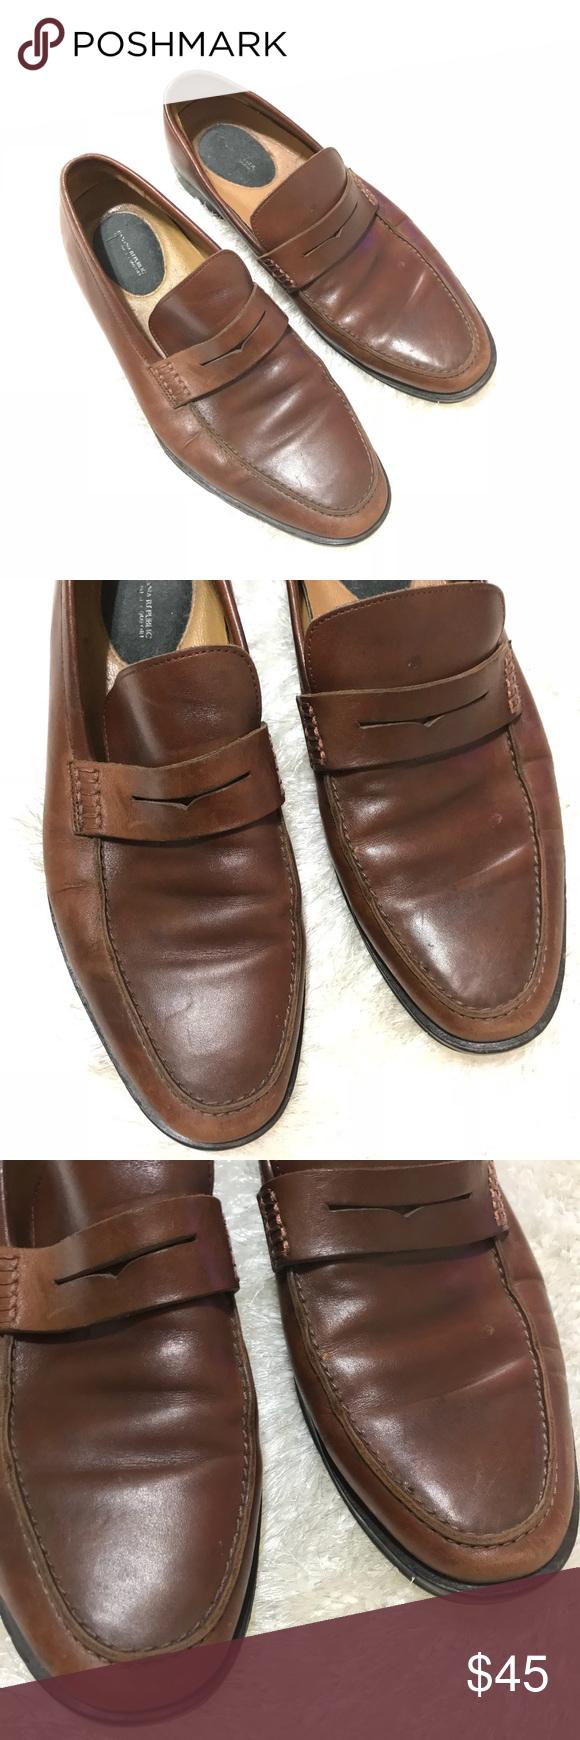 Banana Republic Mens Dellbrook Italian Leather Loafer Size 10 eqCmi